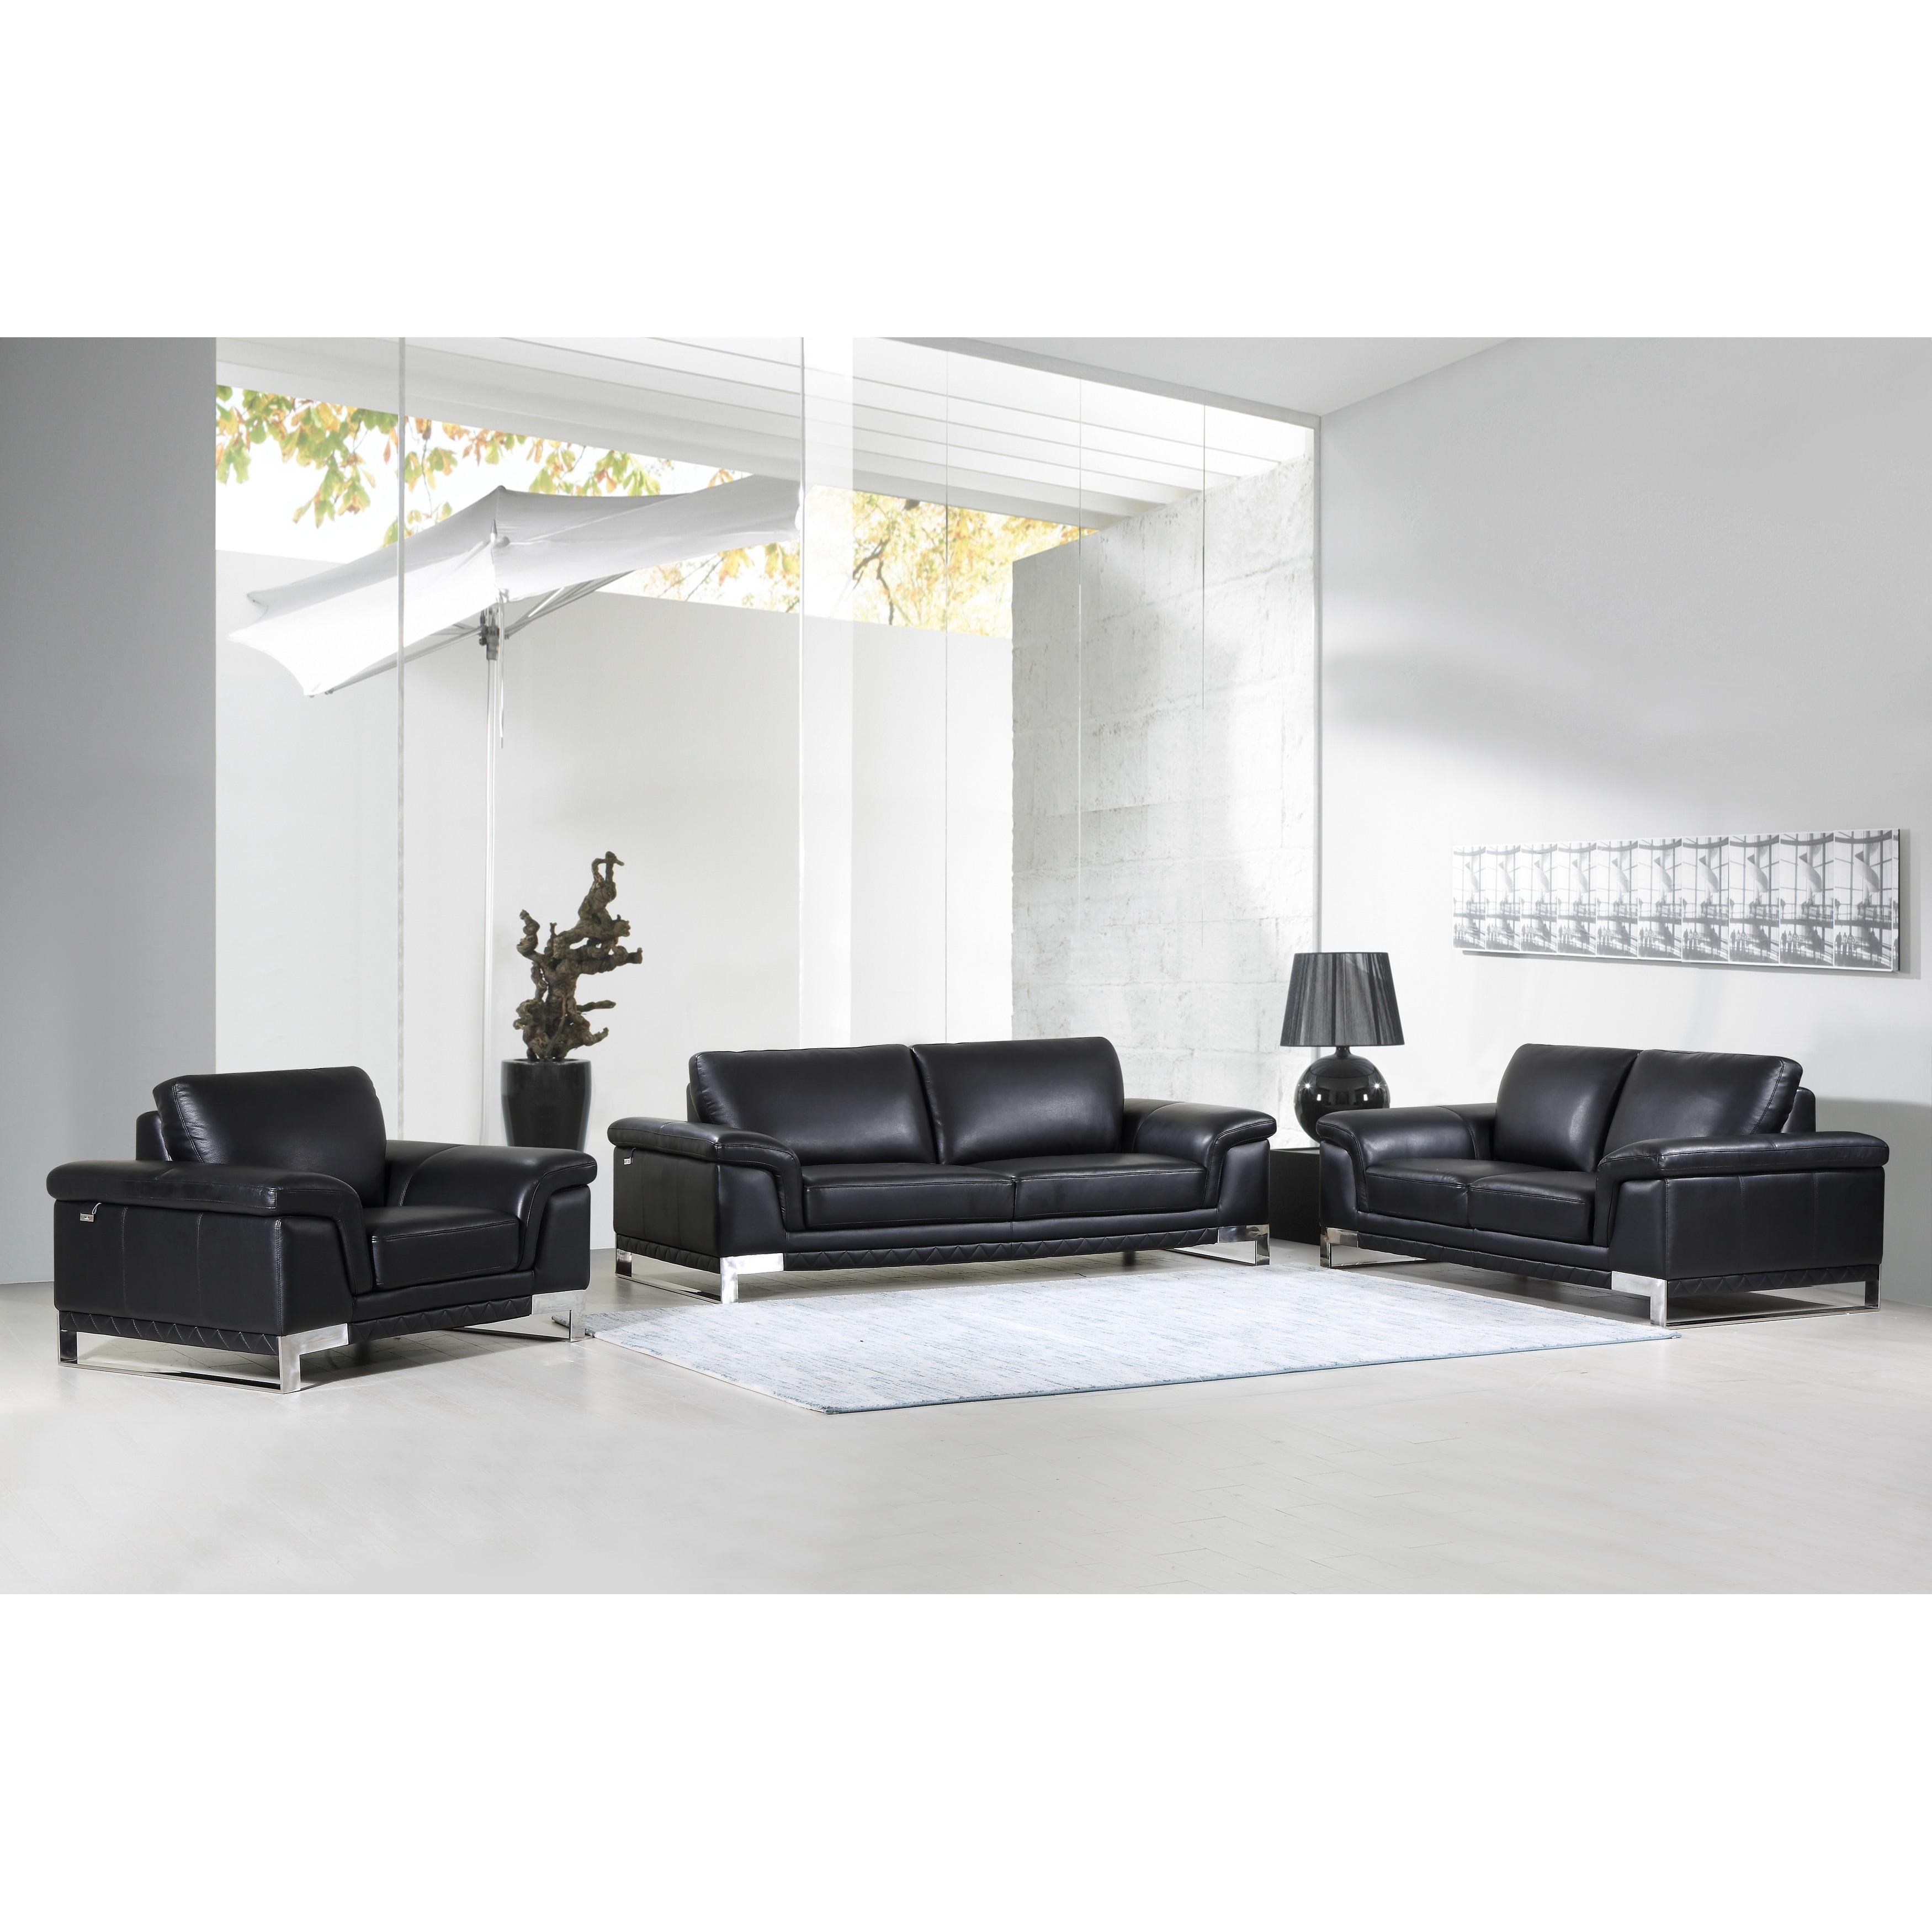 DivanItalia Arezzo Luxury Italian Leather Upholstered Complete 3 ...